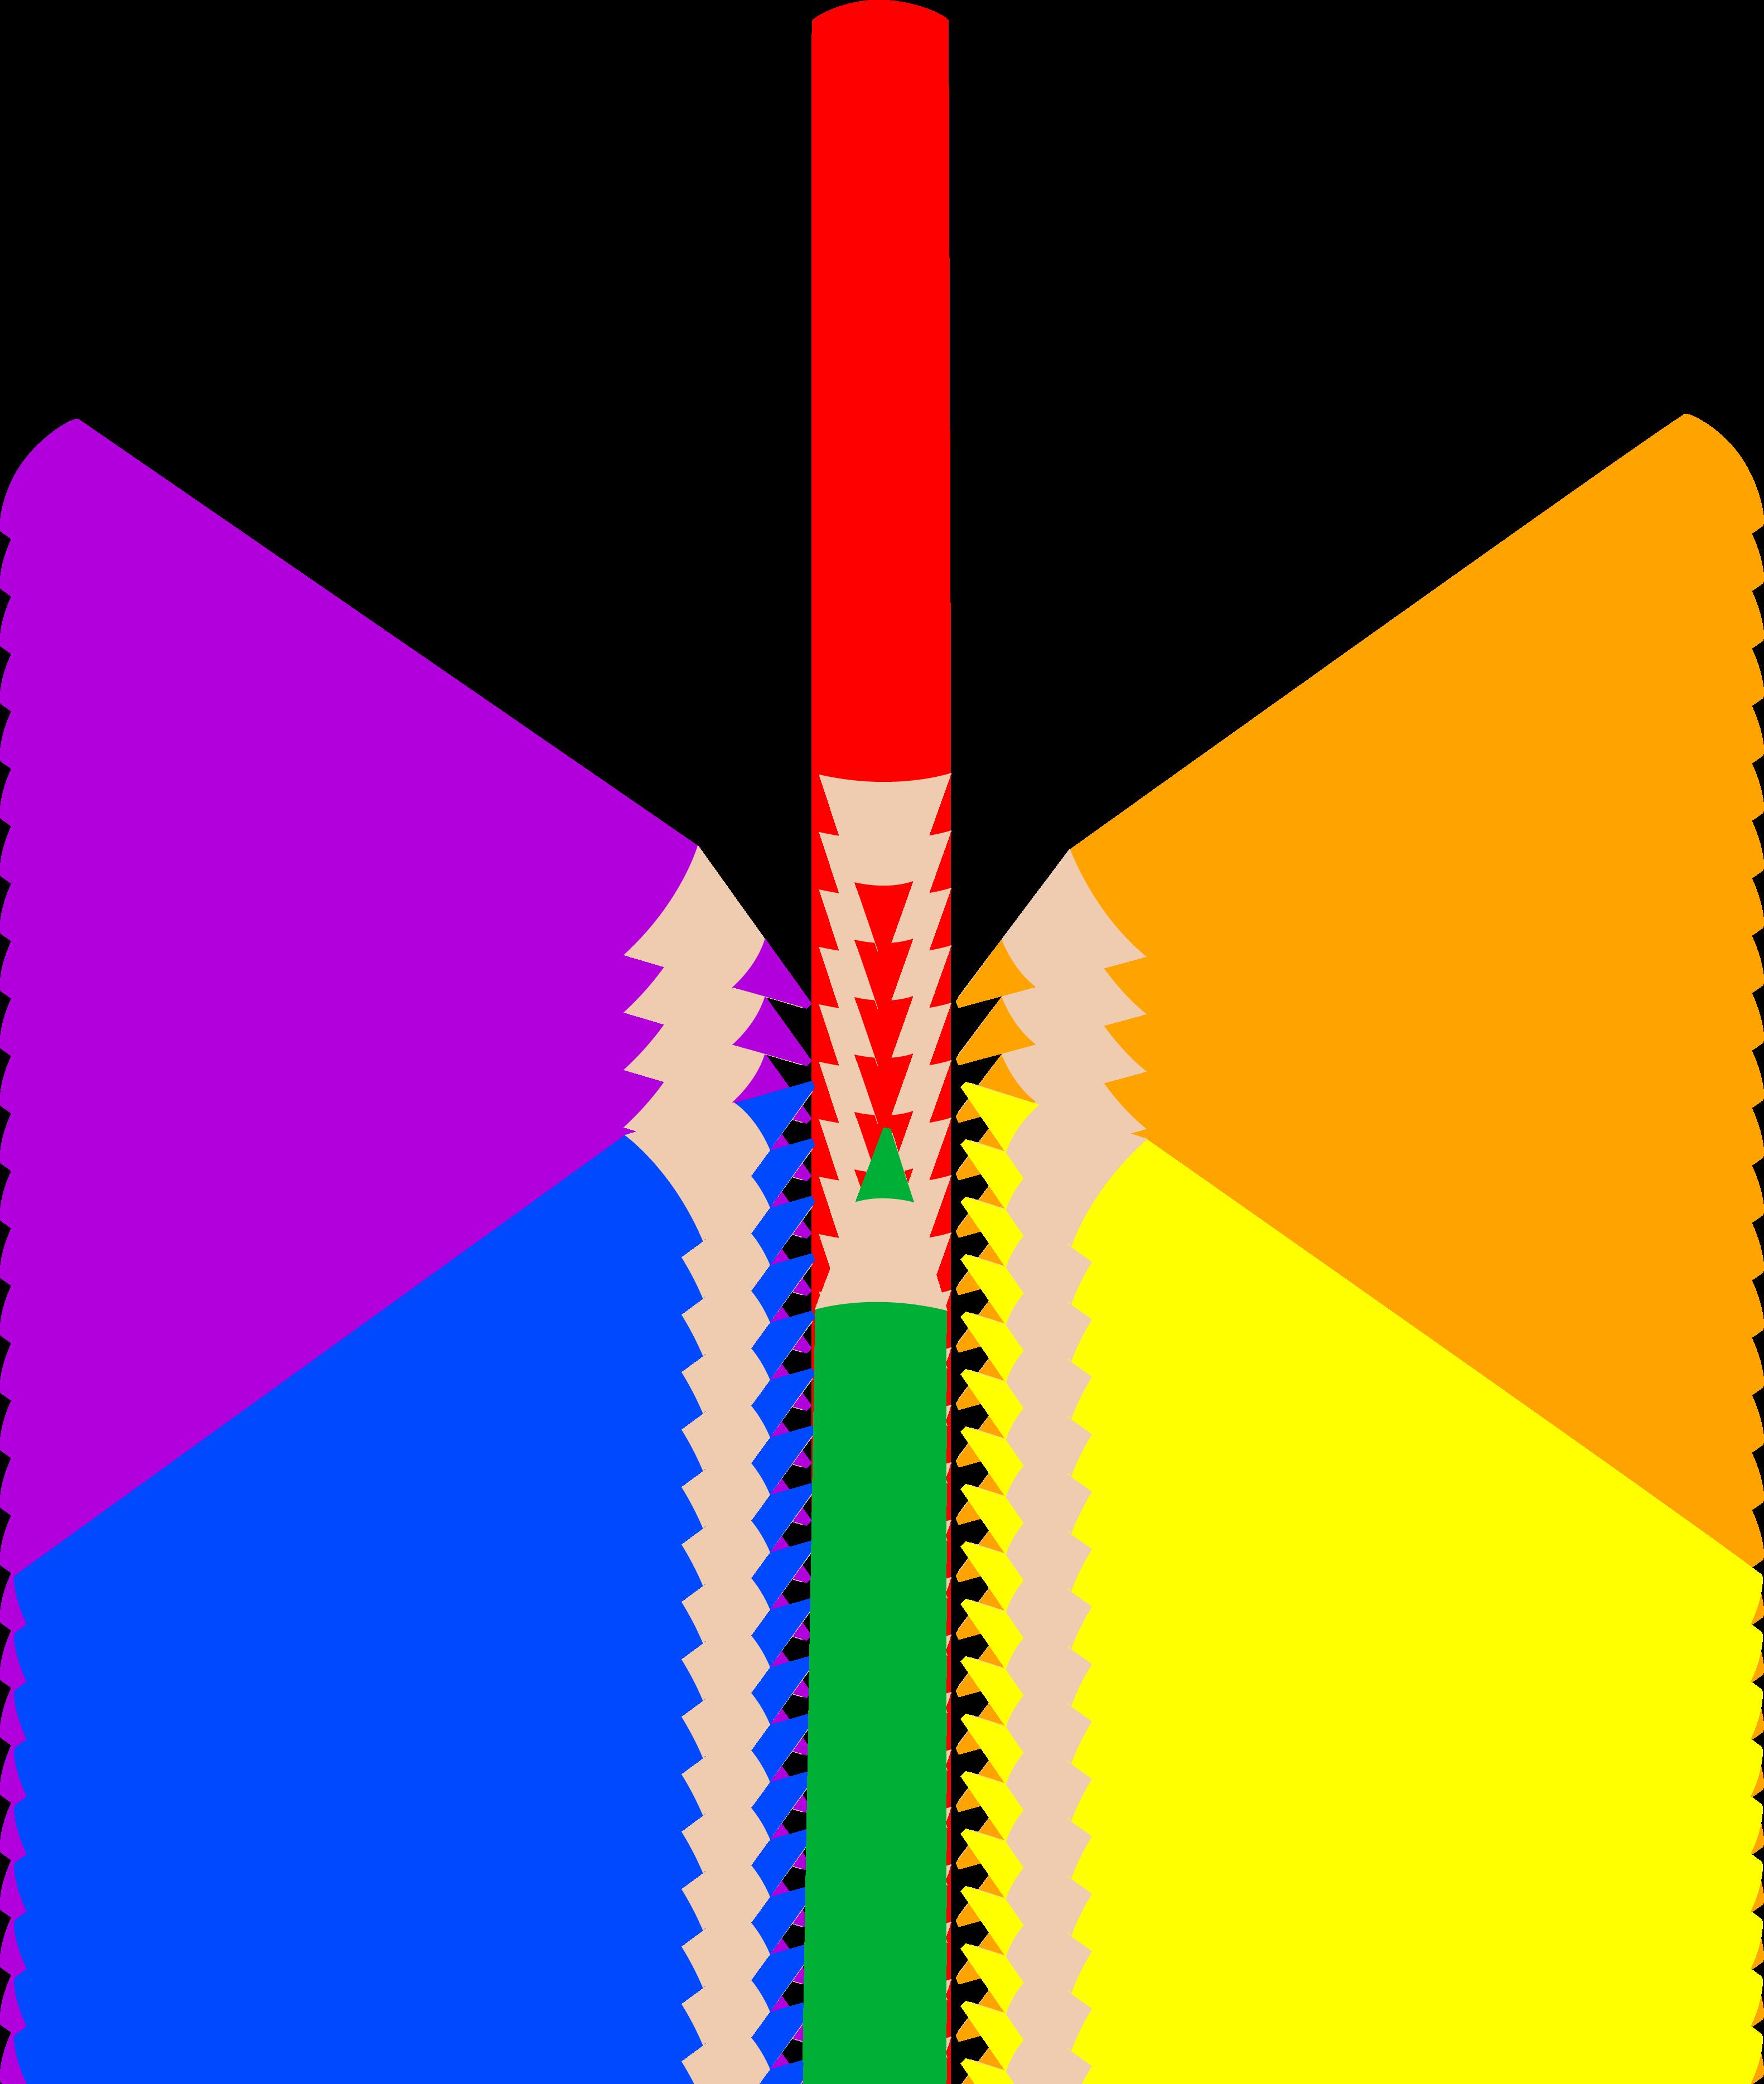 3163x3737 Colored Pencils Clipart